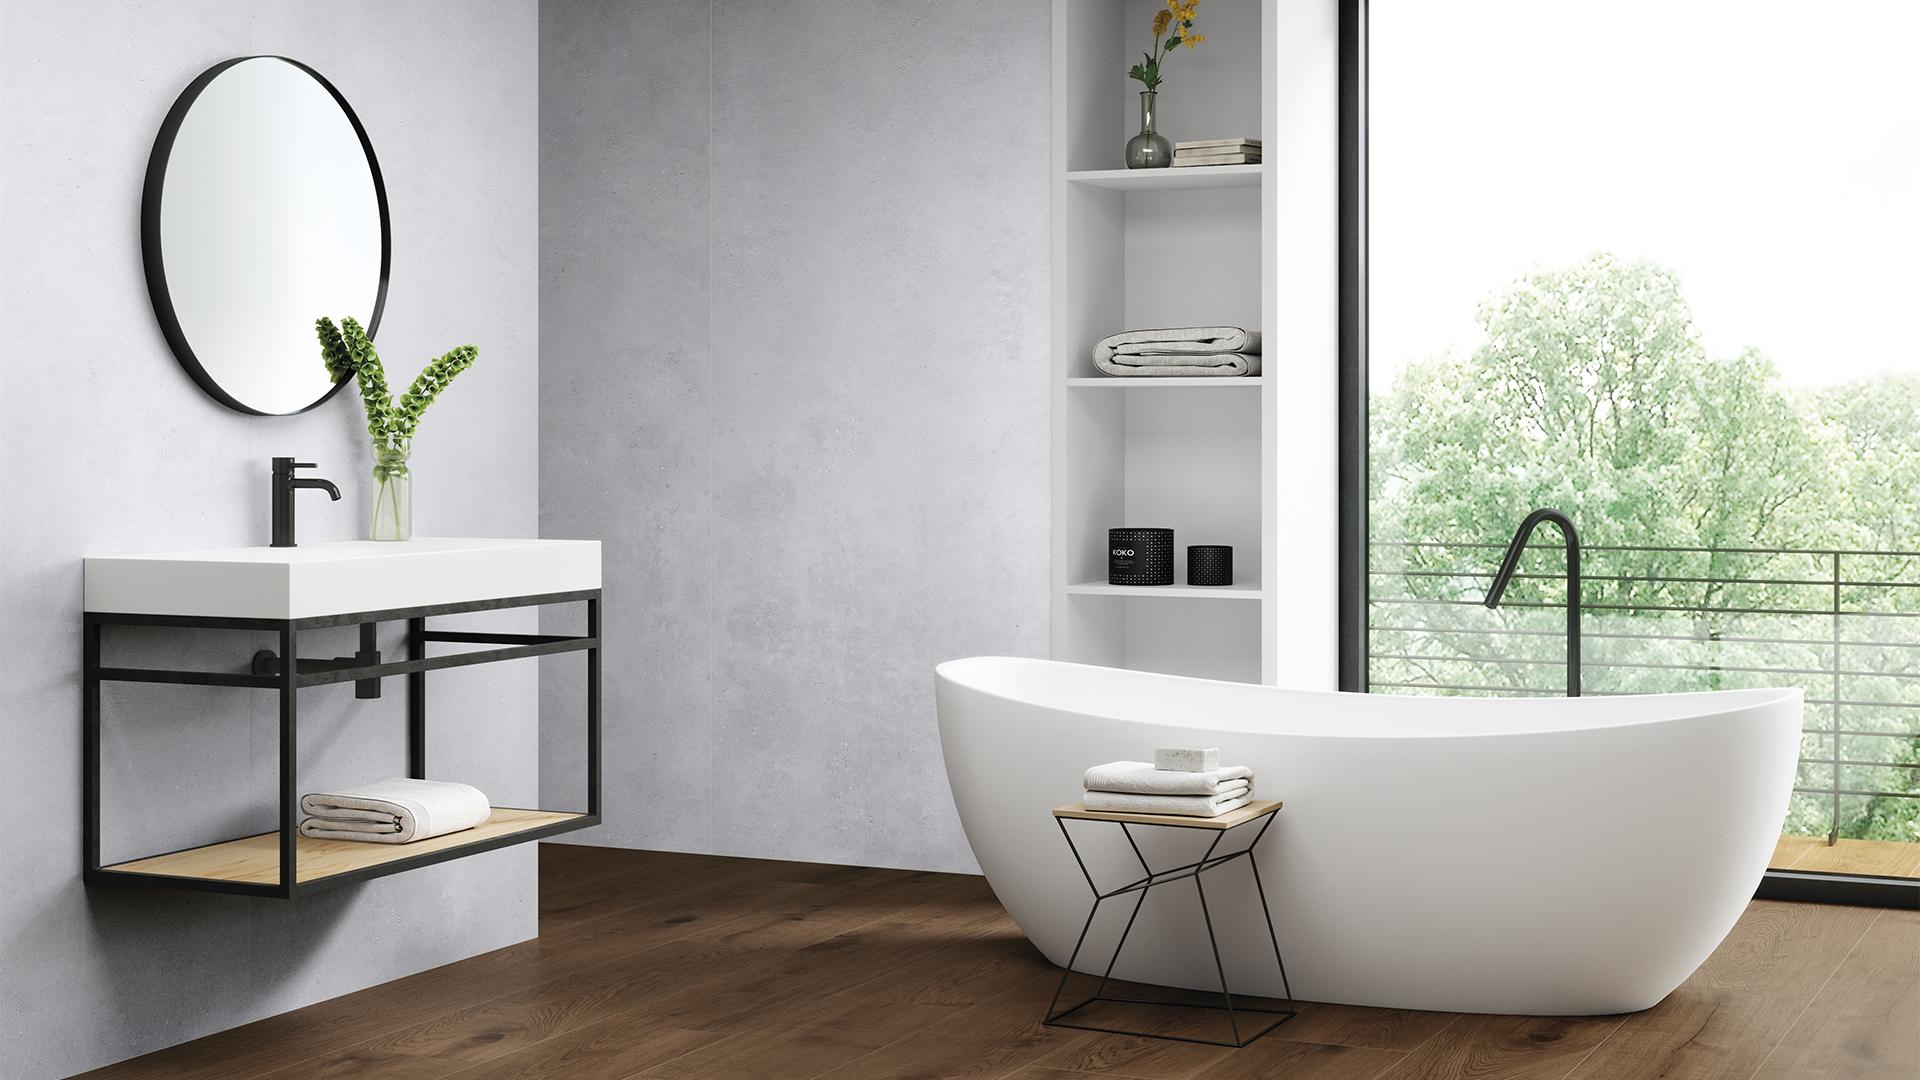 Slide salle de bains 1